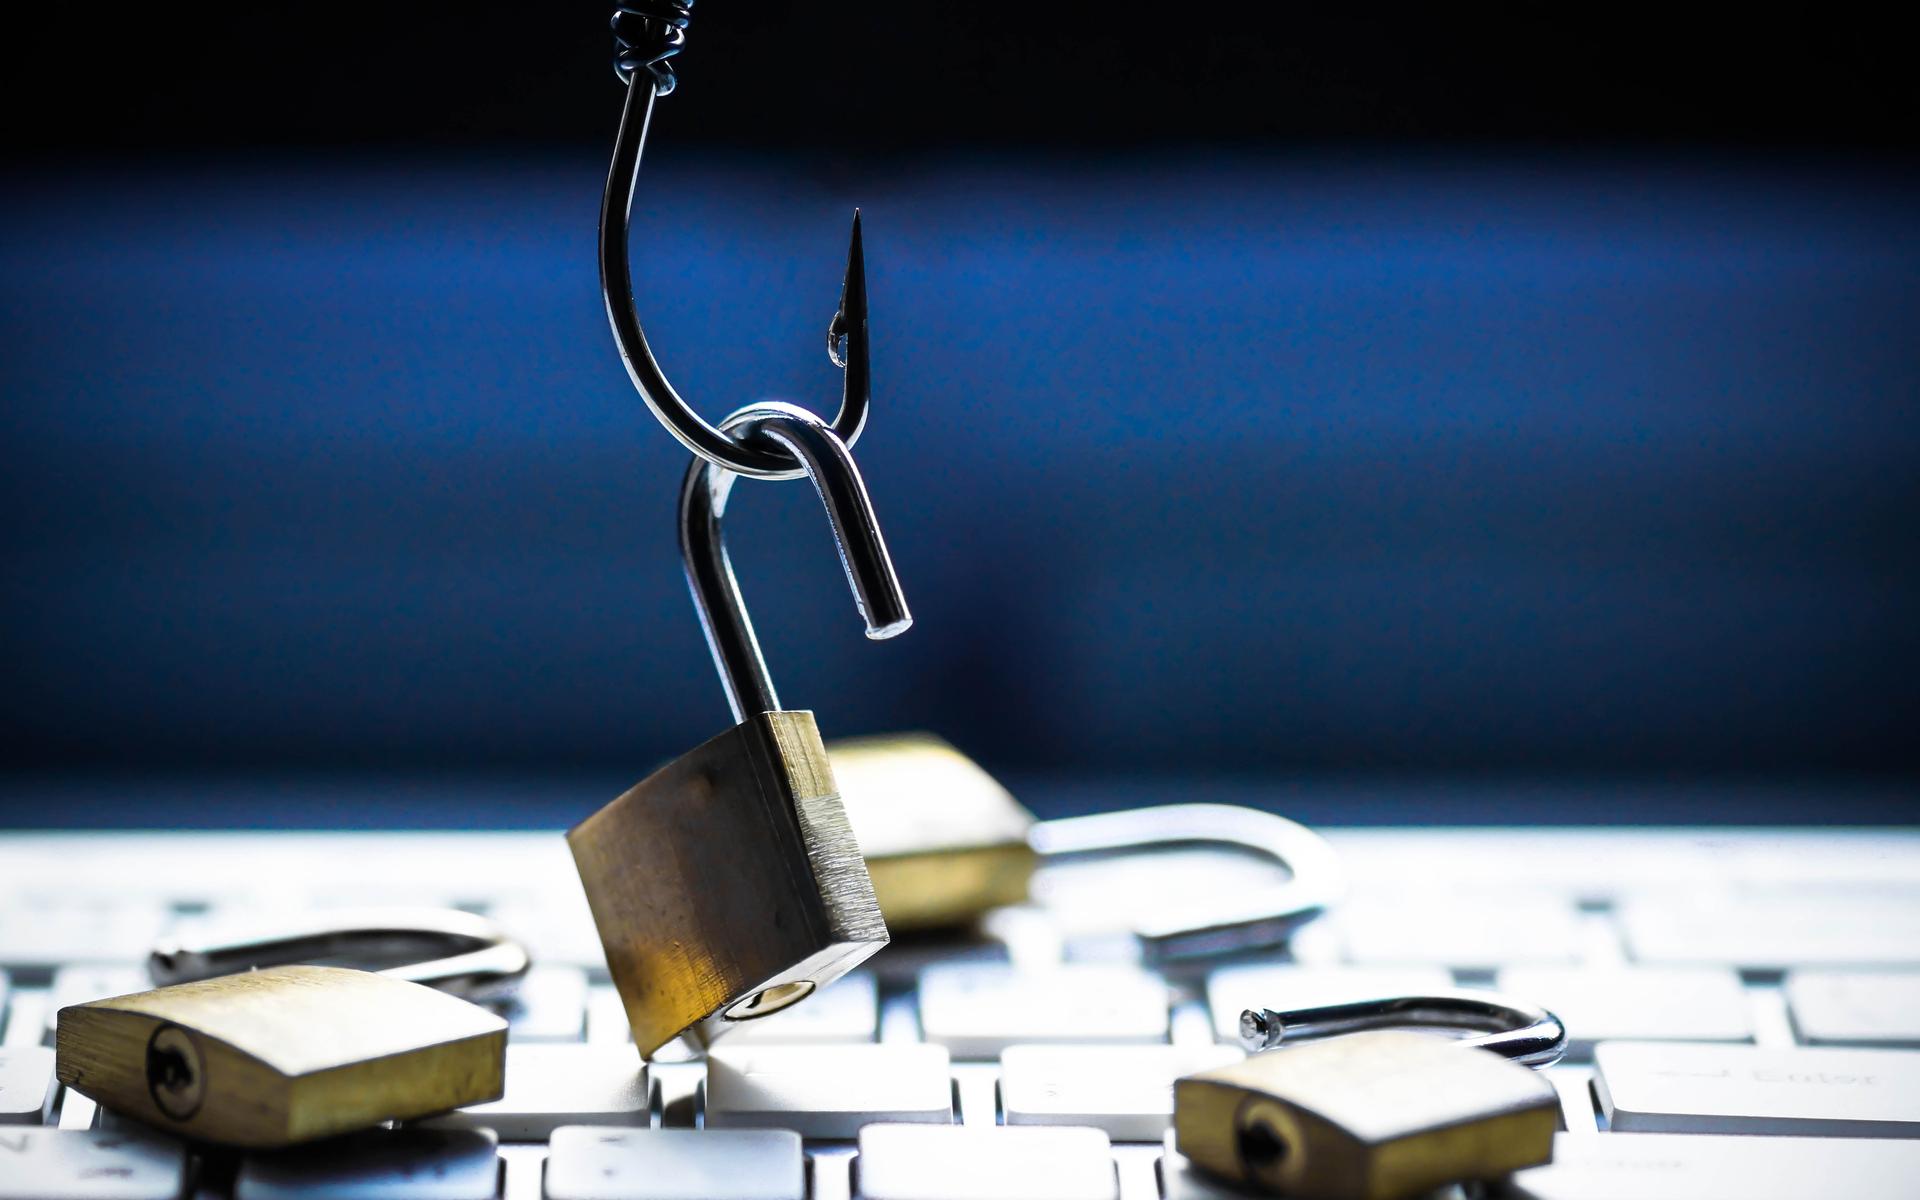 Electrum wallet phishing attack